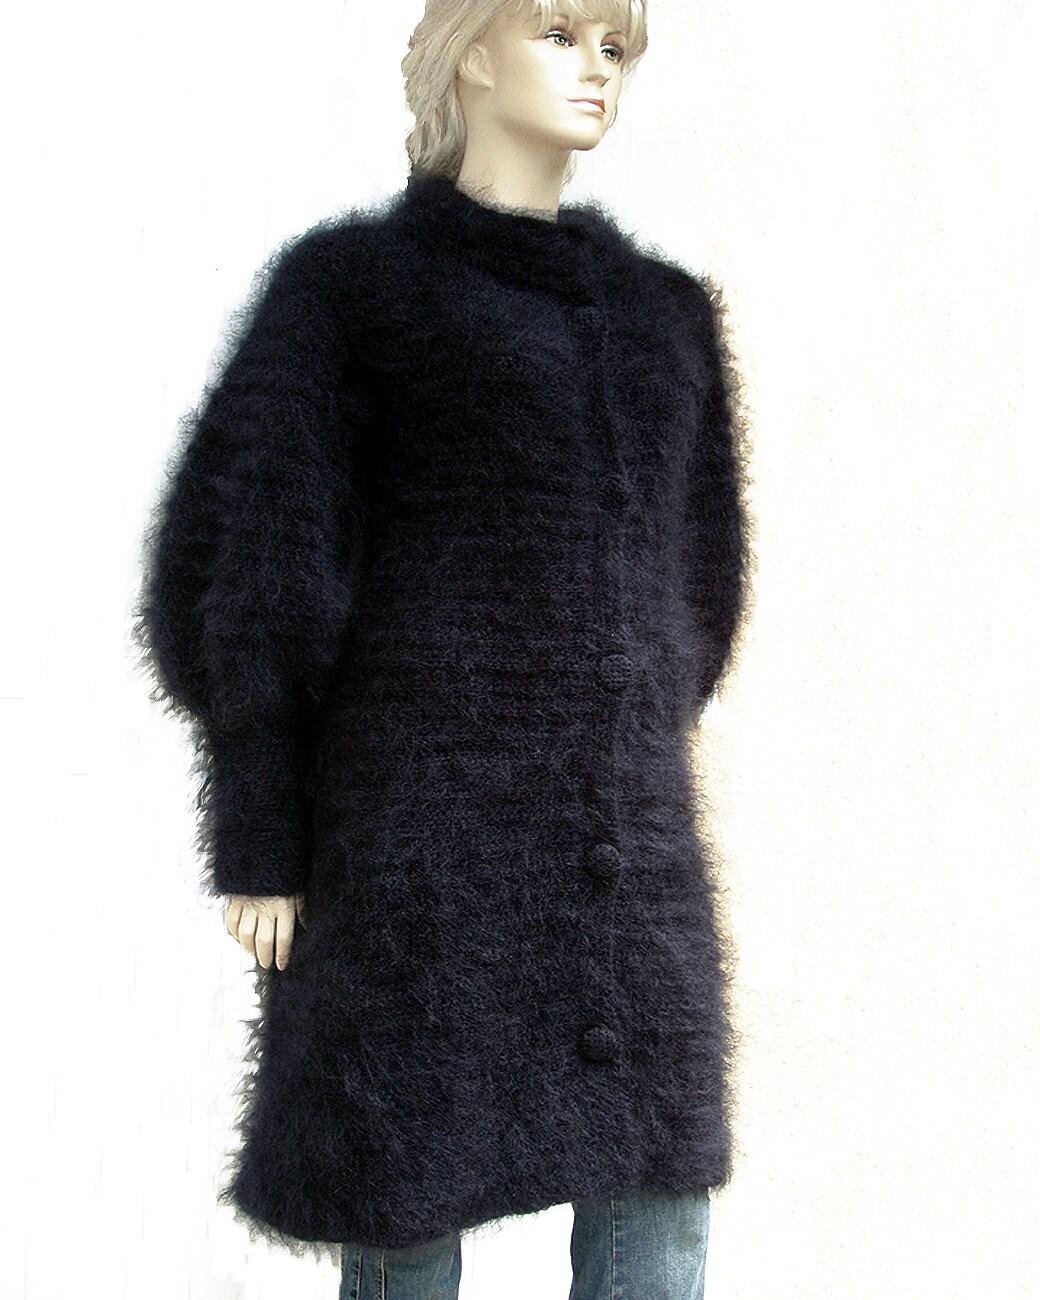 Funnel Neck Black Mohair Coat Long Cardigan Sweater Coat